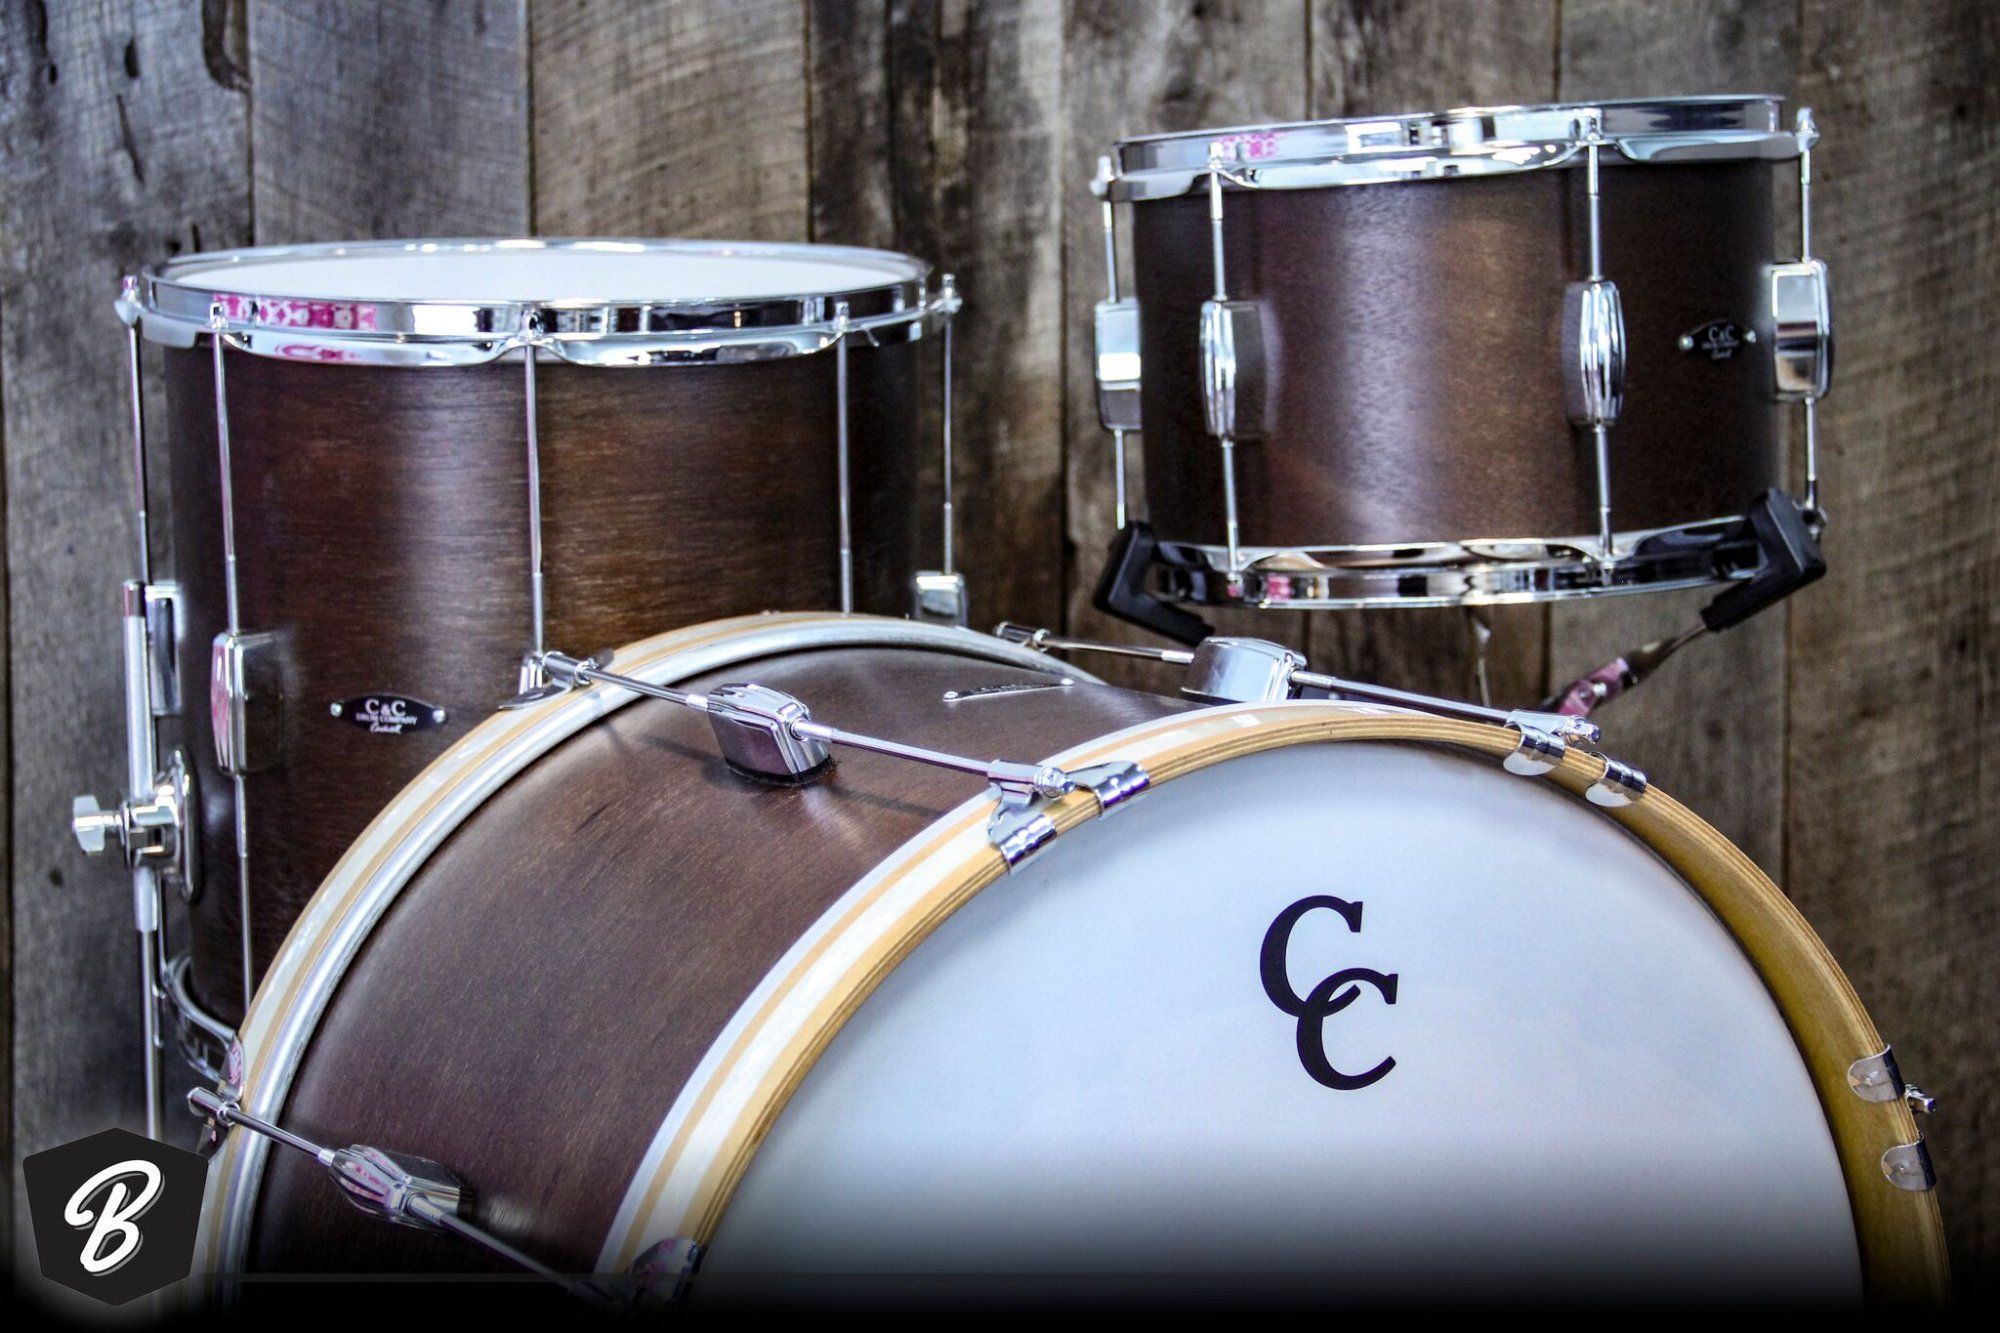 C&C Drum Company Player Date I Be-bop kit in Walnut Satin